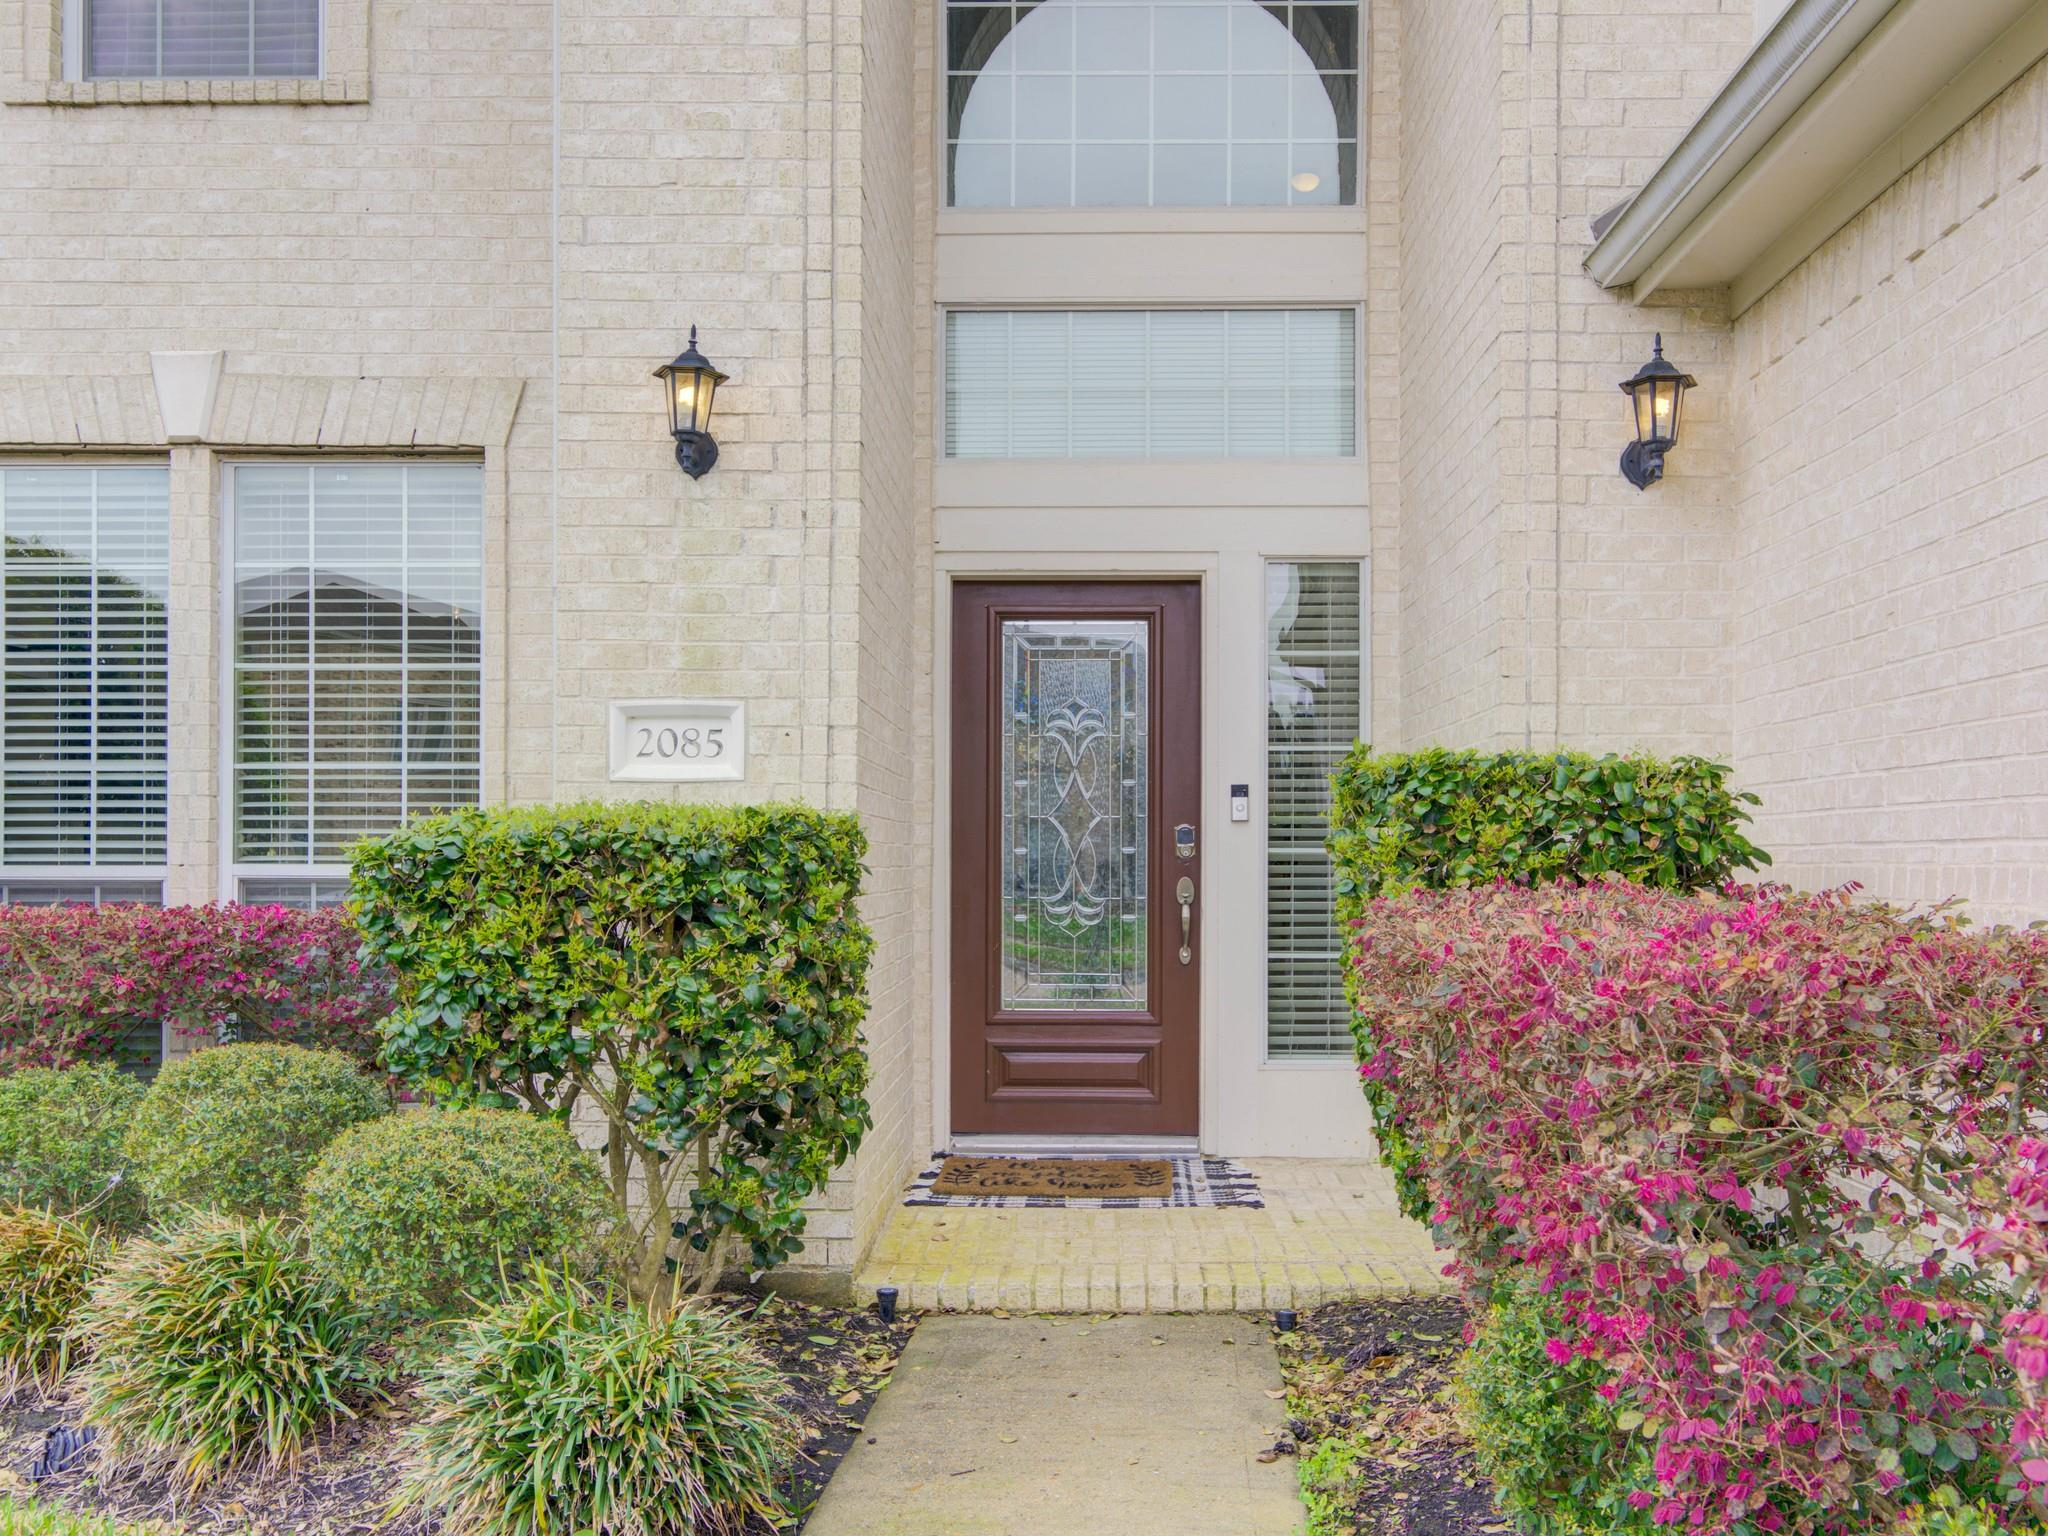 2085 Dillonwood Court Property Photo - Kemah, TX real estate listing